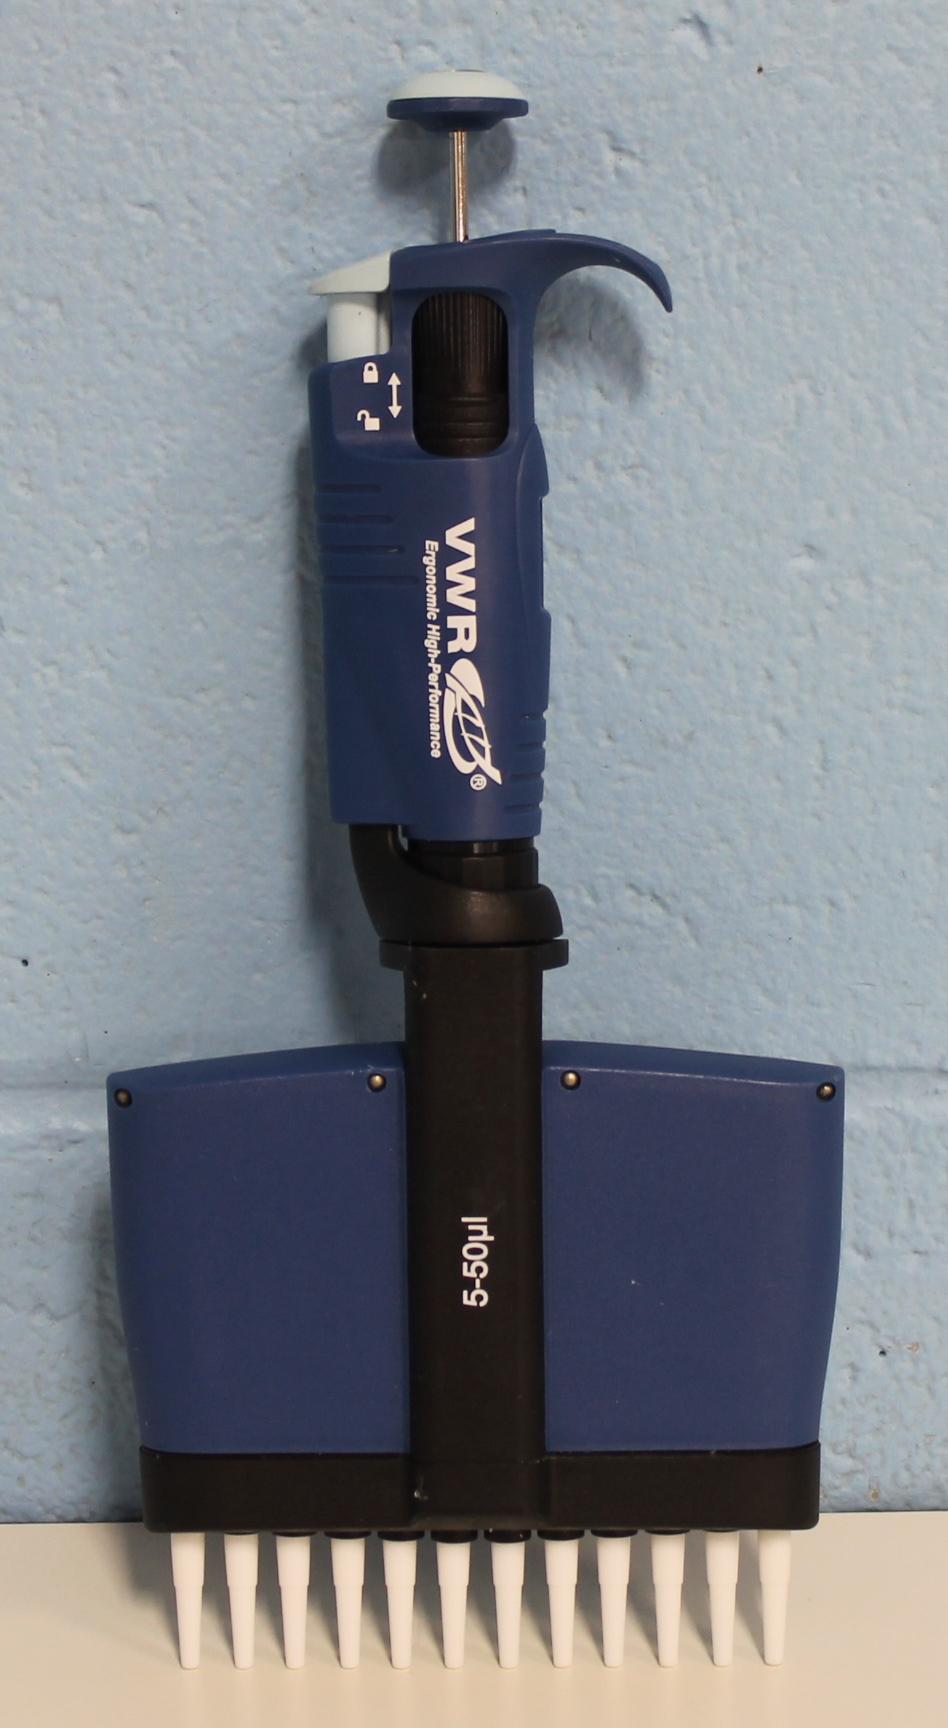 VWR 12- Channel 5-50 uL Signature Ergonomic High Performance Pipettor Image